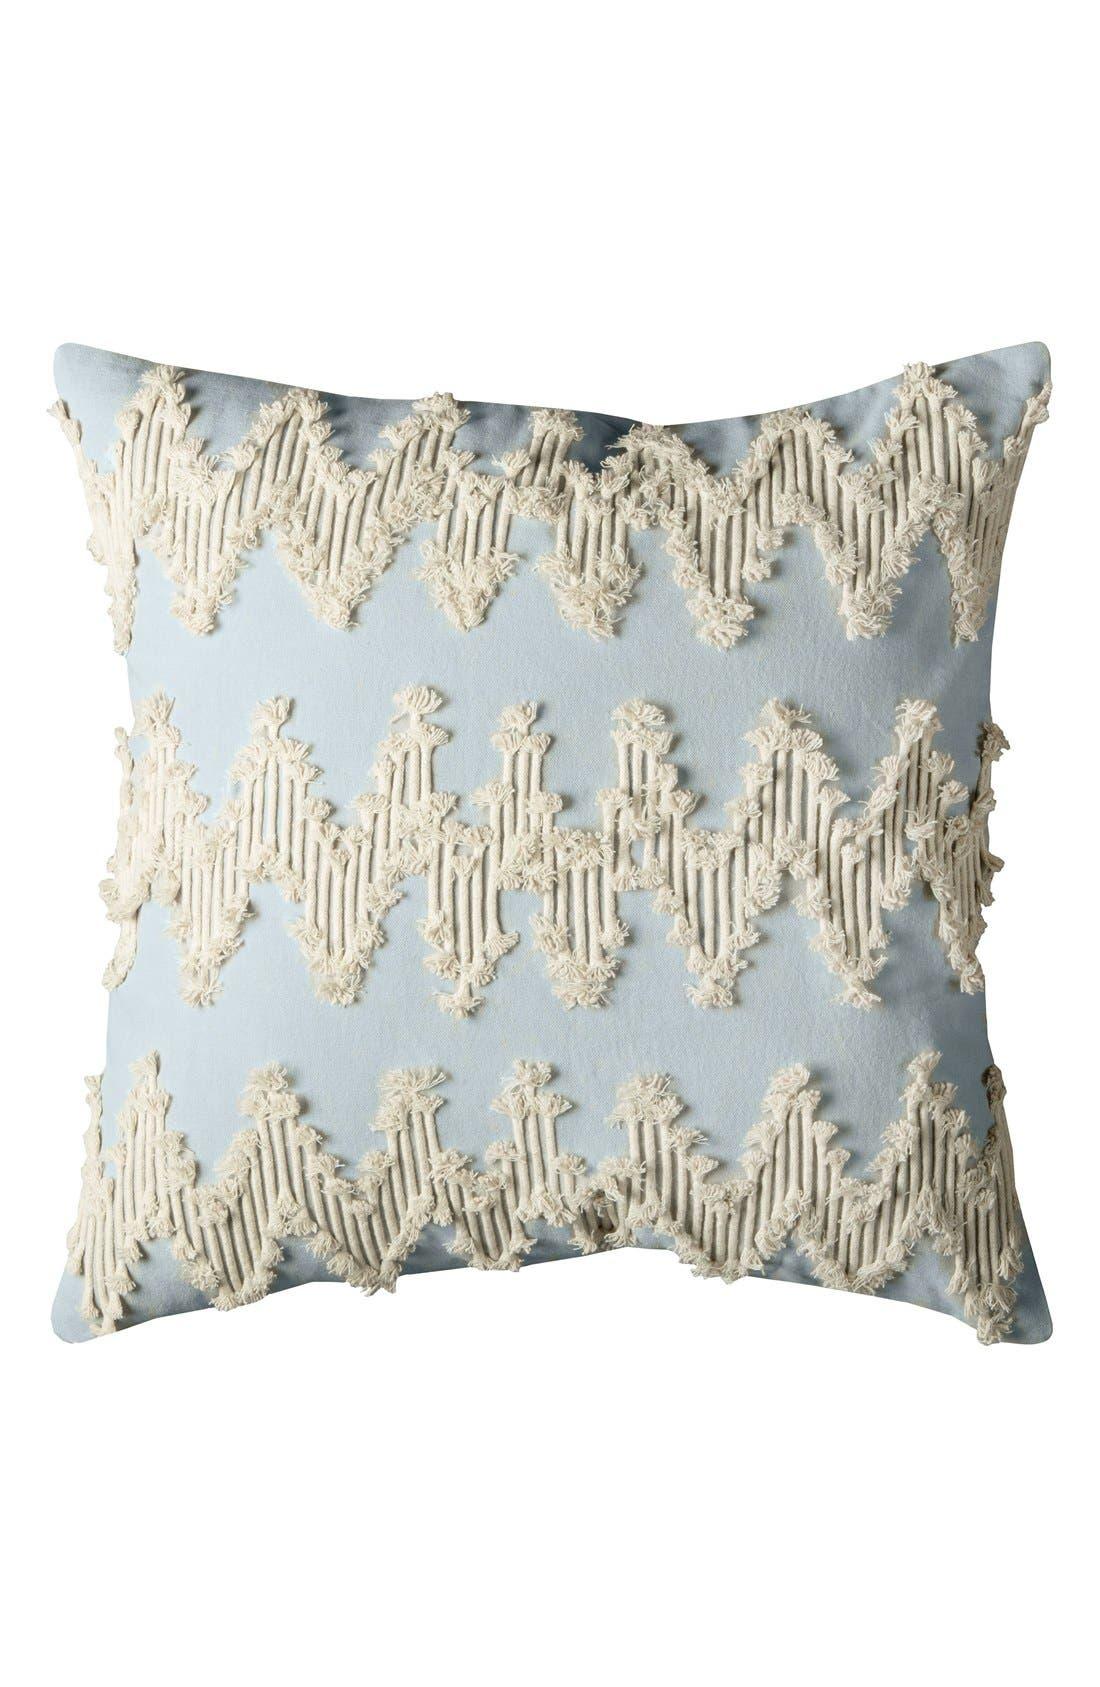 Embroidered Chevron Pillow,                             Main thumbnail 1, color,                             Blue/ Natural